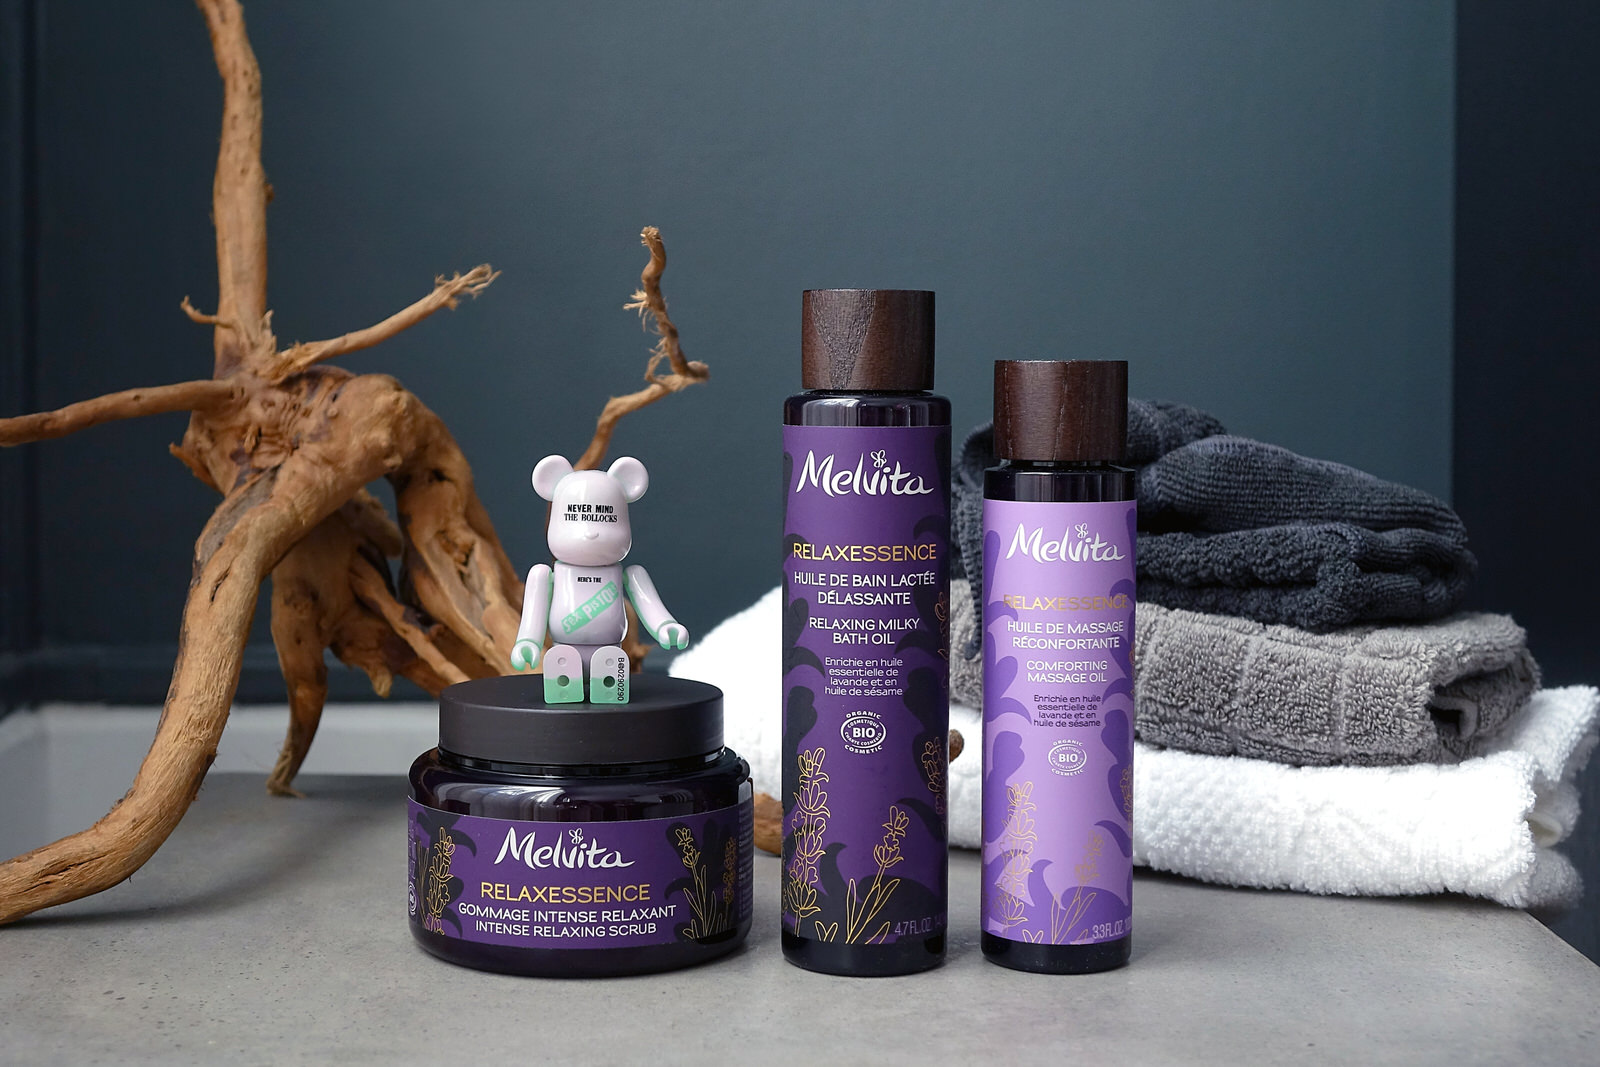 La gamme Relaxessence de Melvita